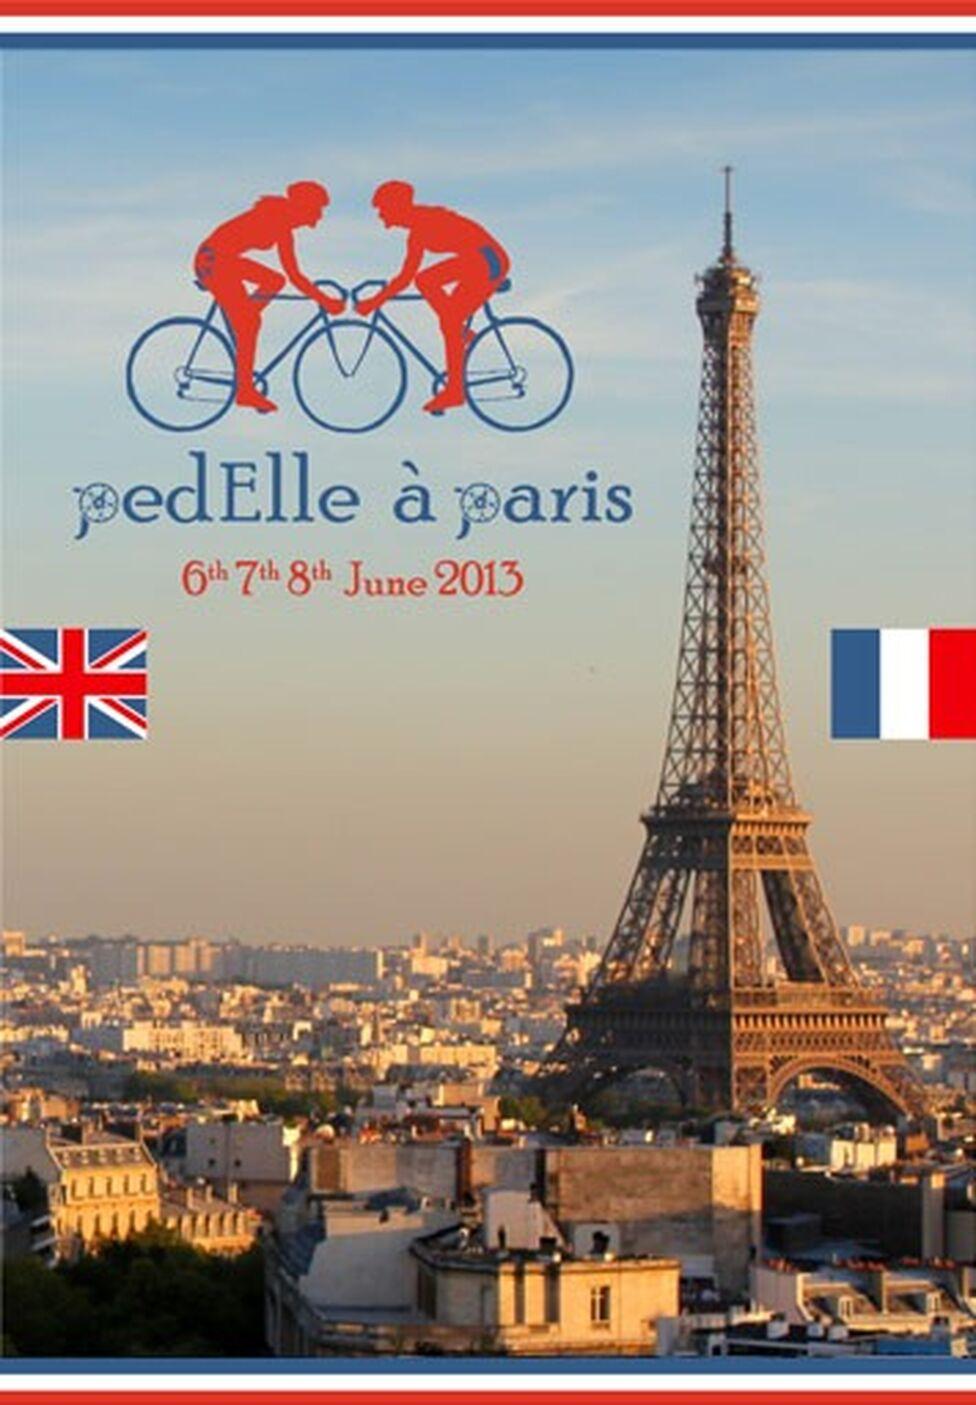 Pedelle1-Featured-355-x-511